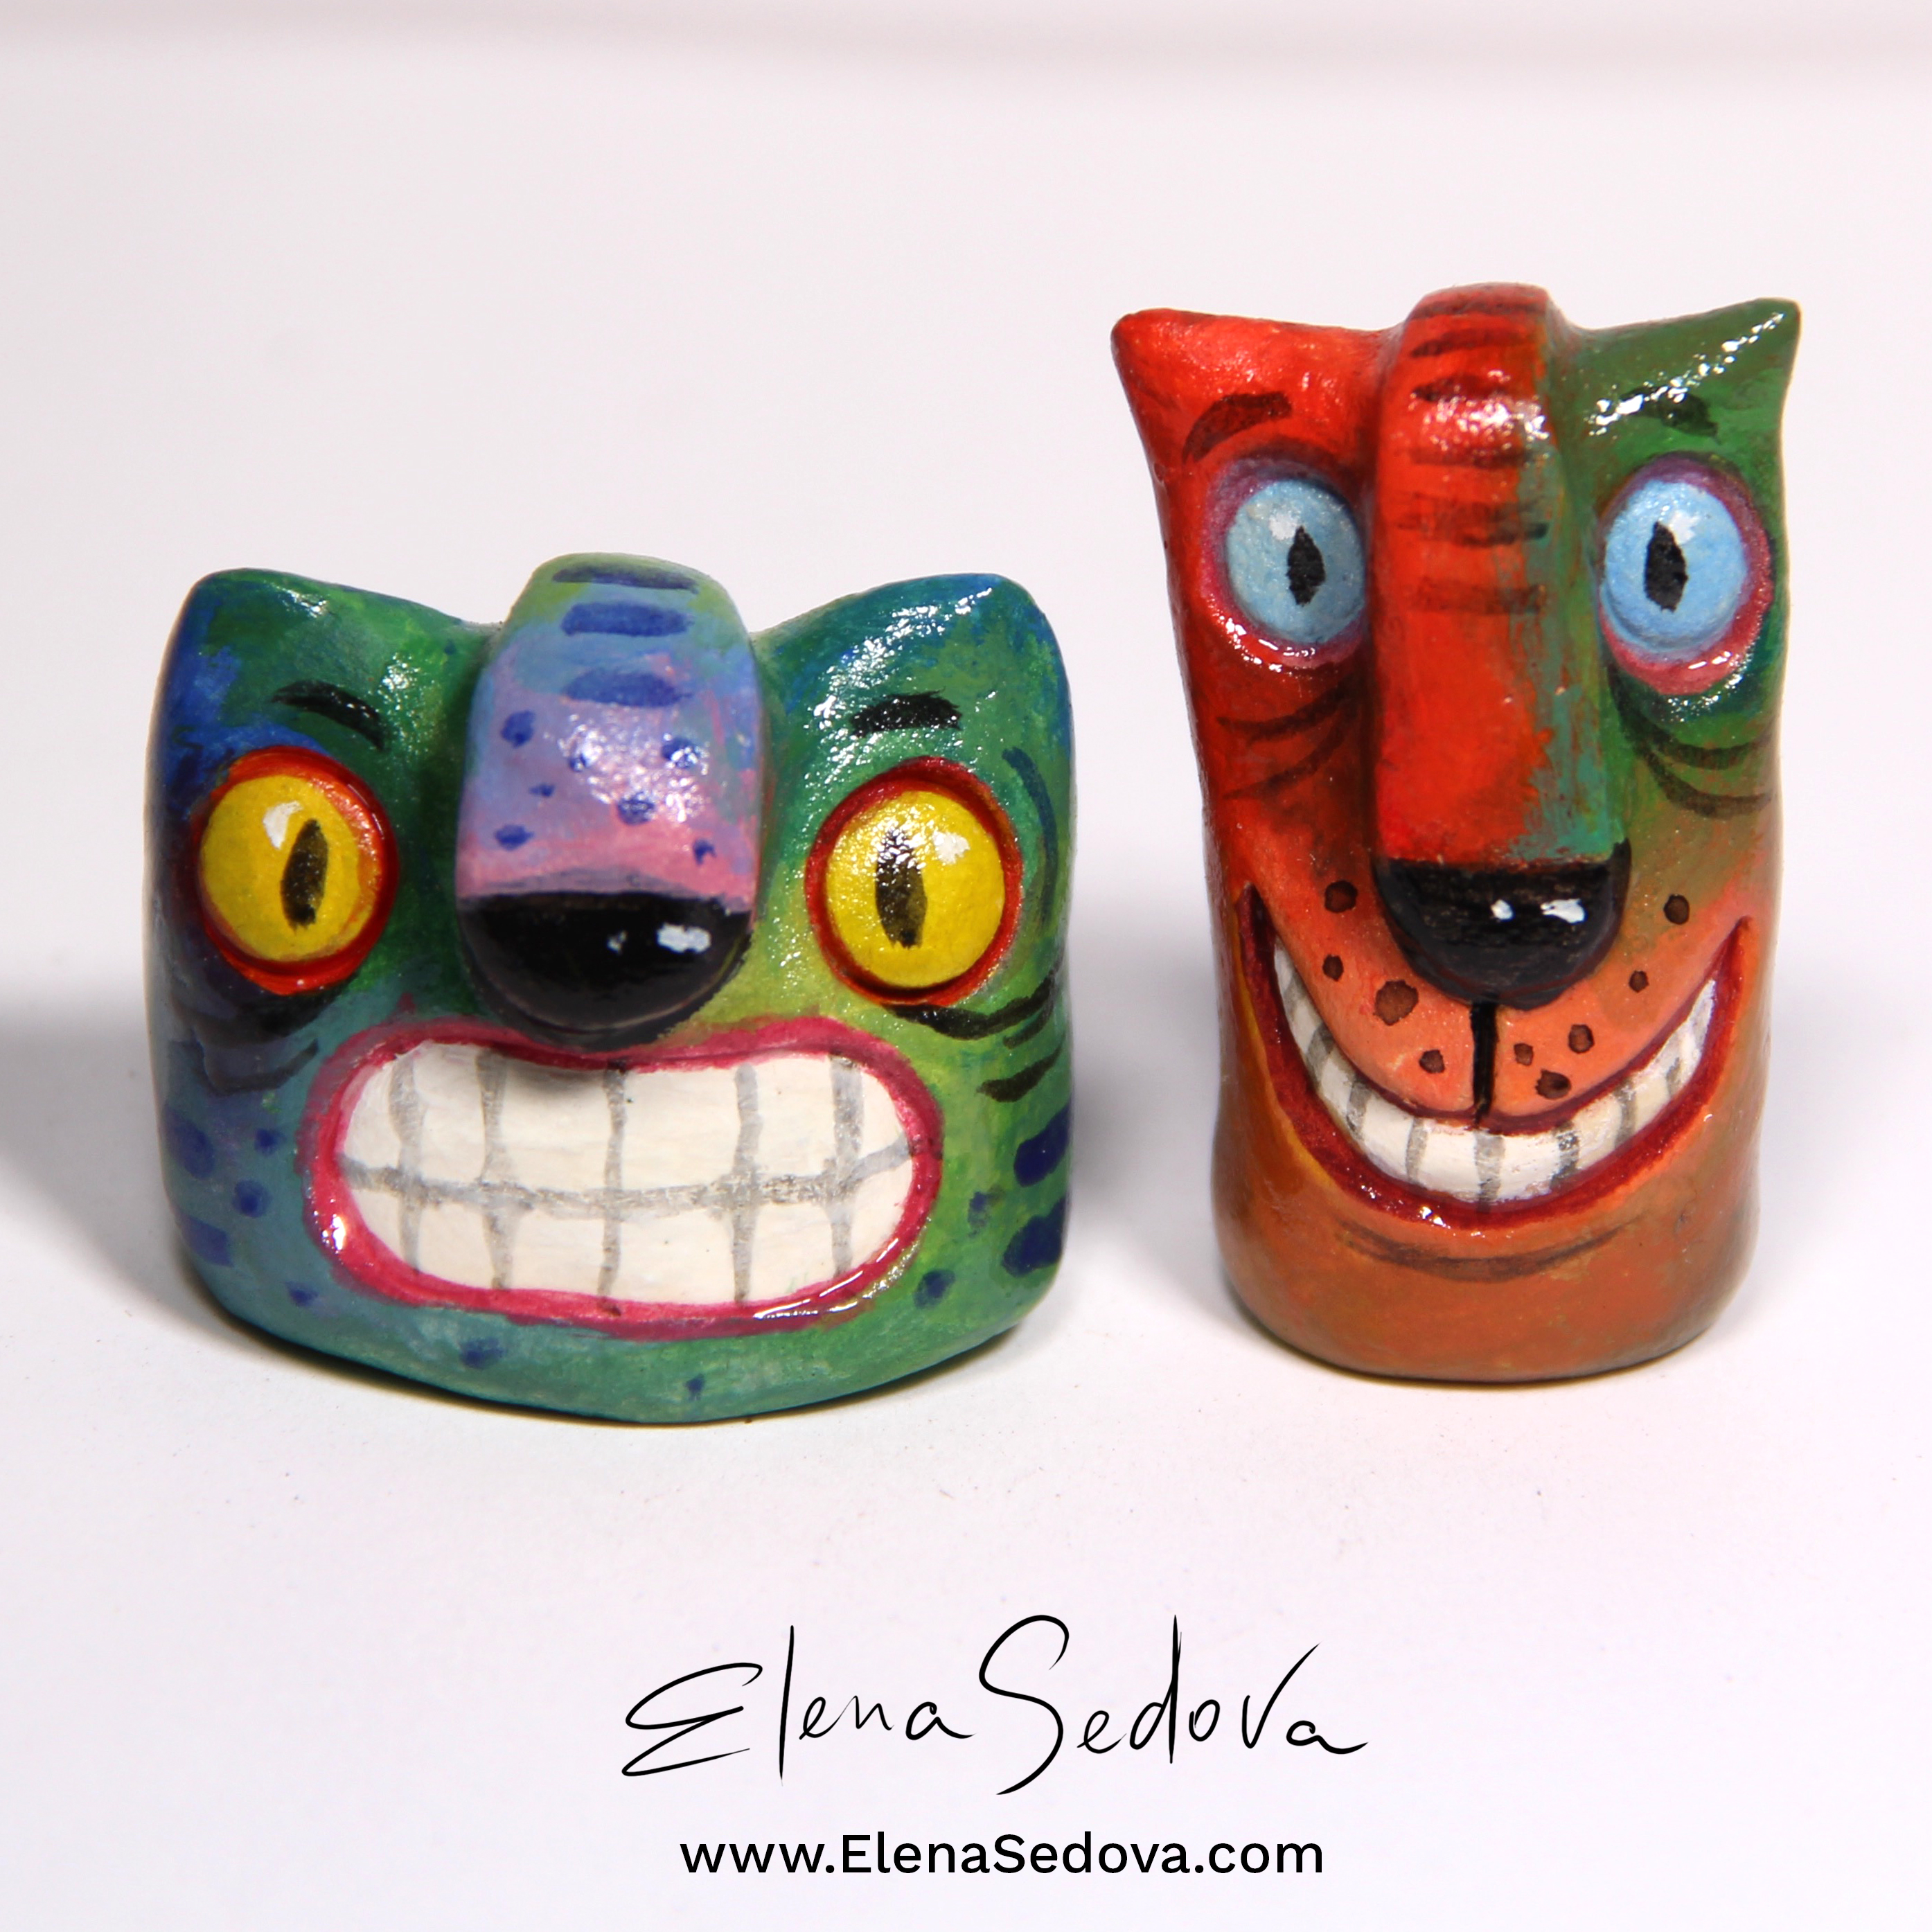 Two Cats mini sculpture